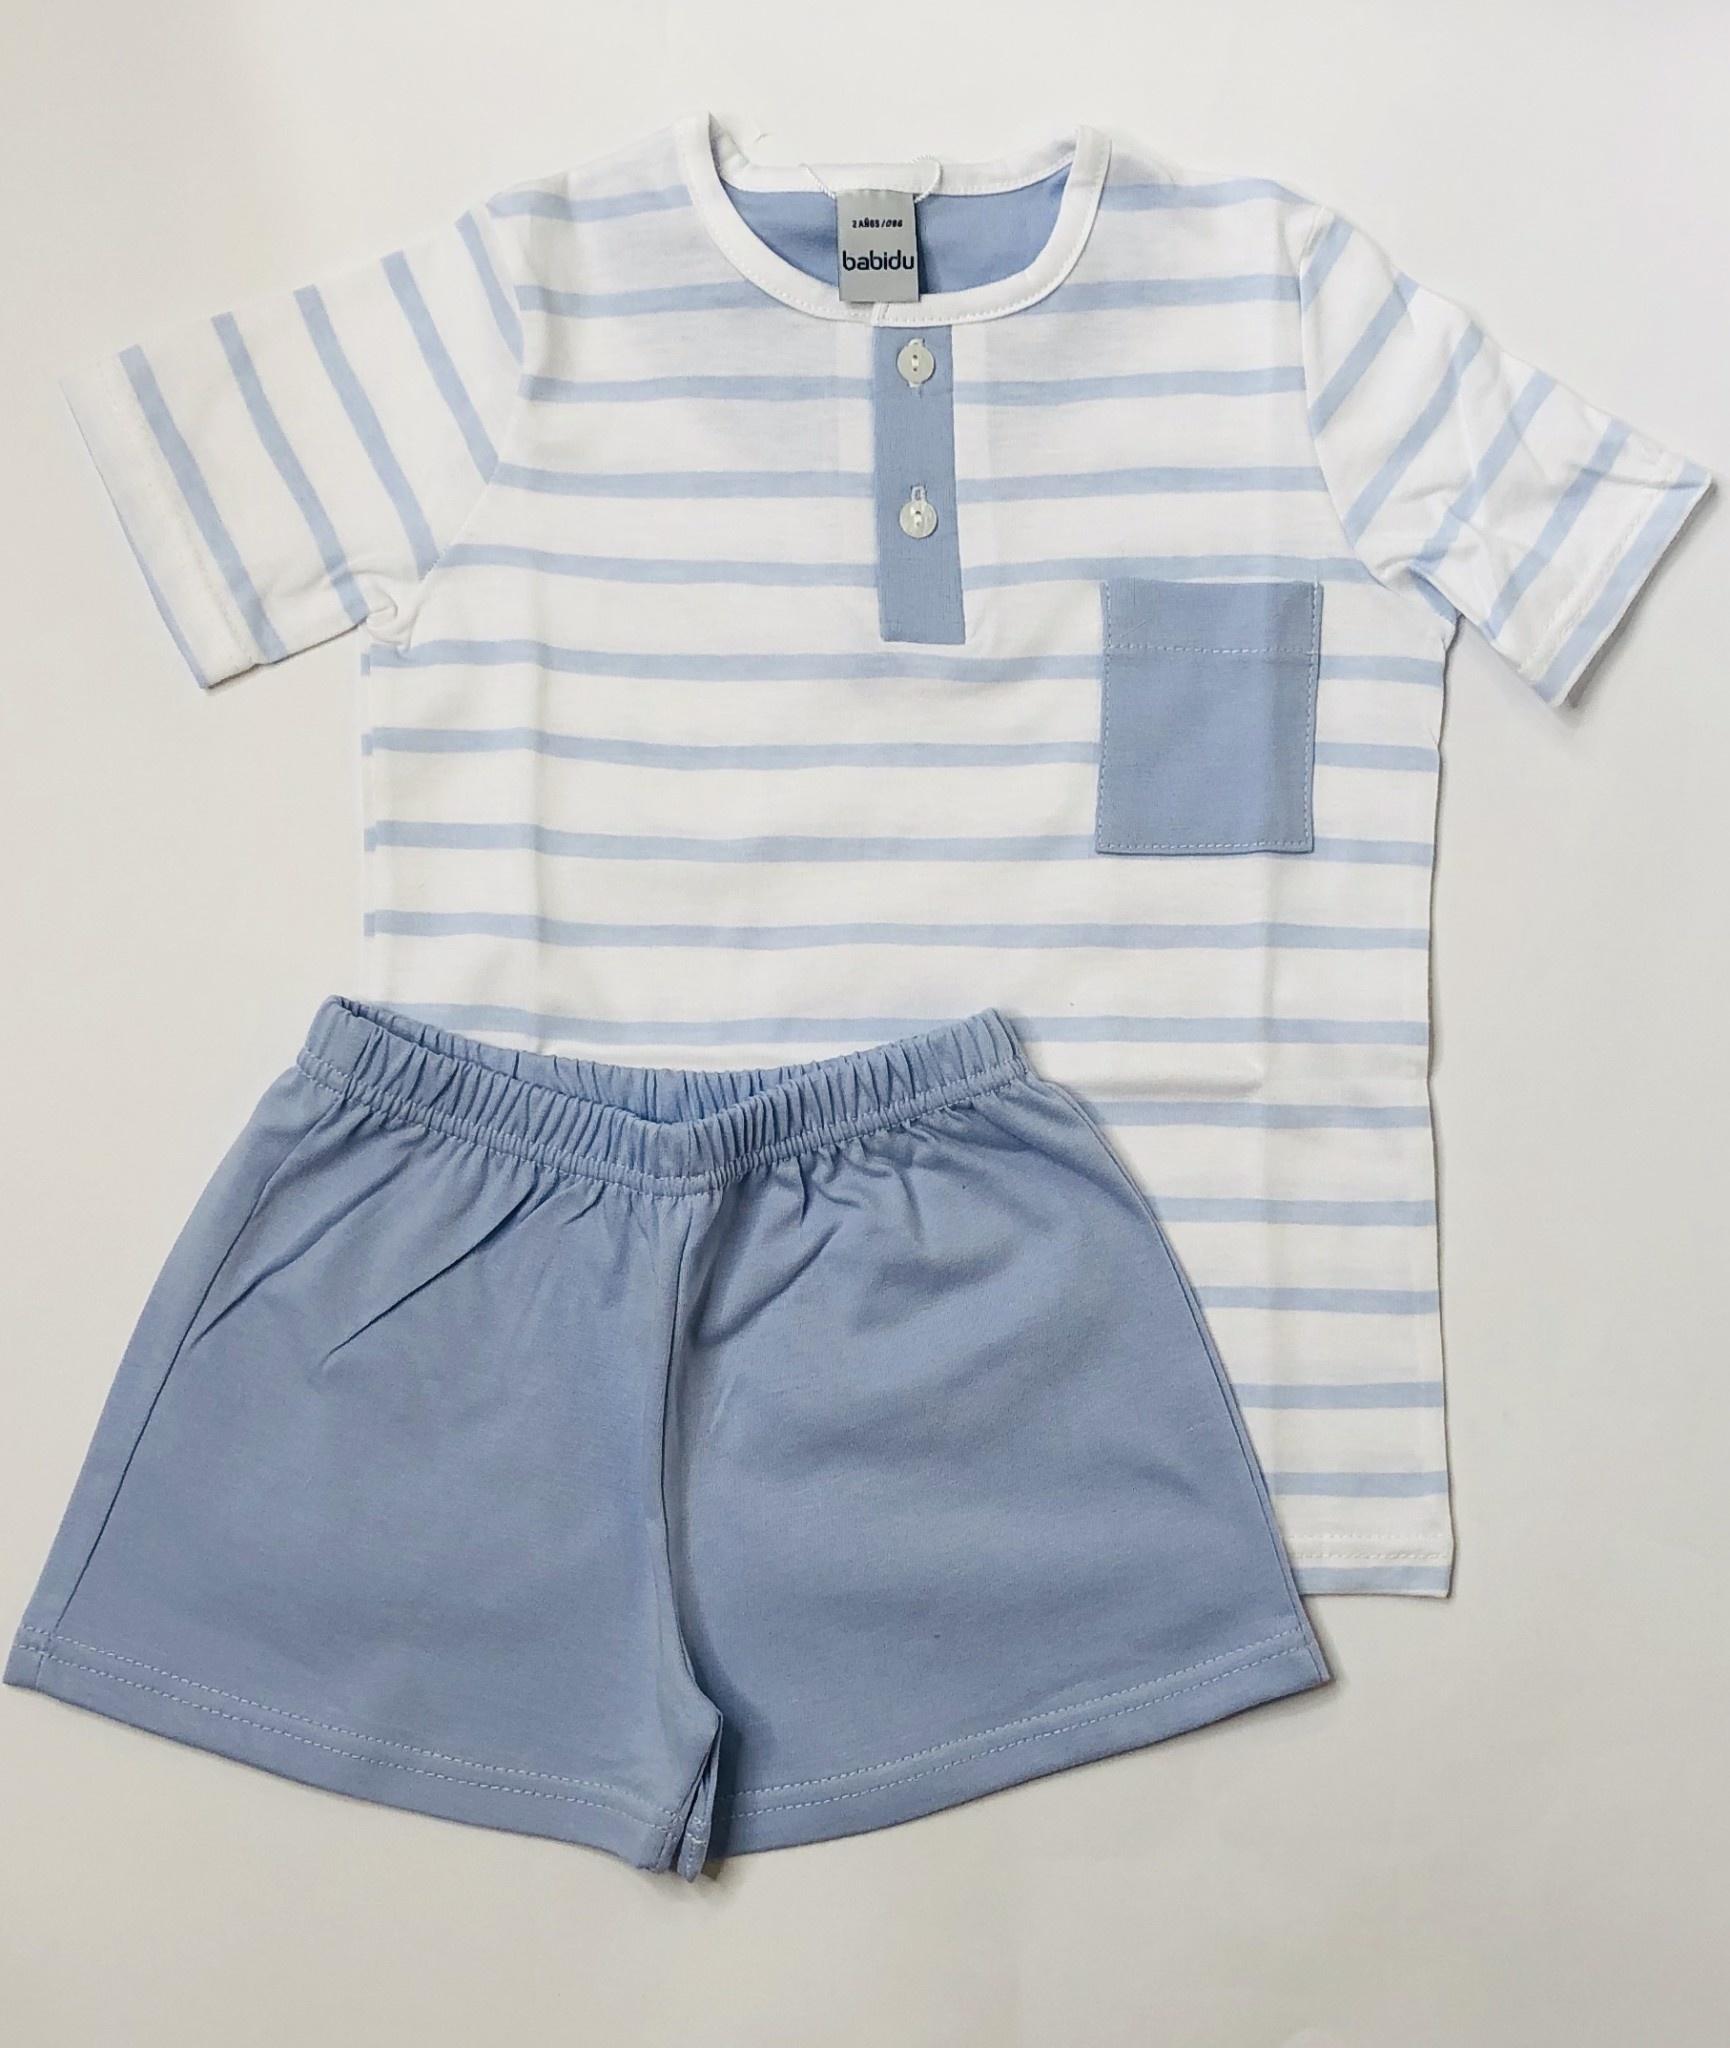 Babidu Babidu 72209 Boys Blue Stripe Pyjama Set